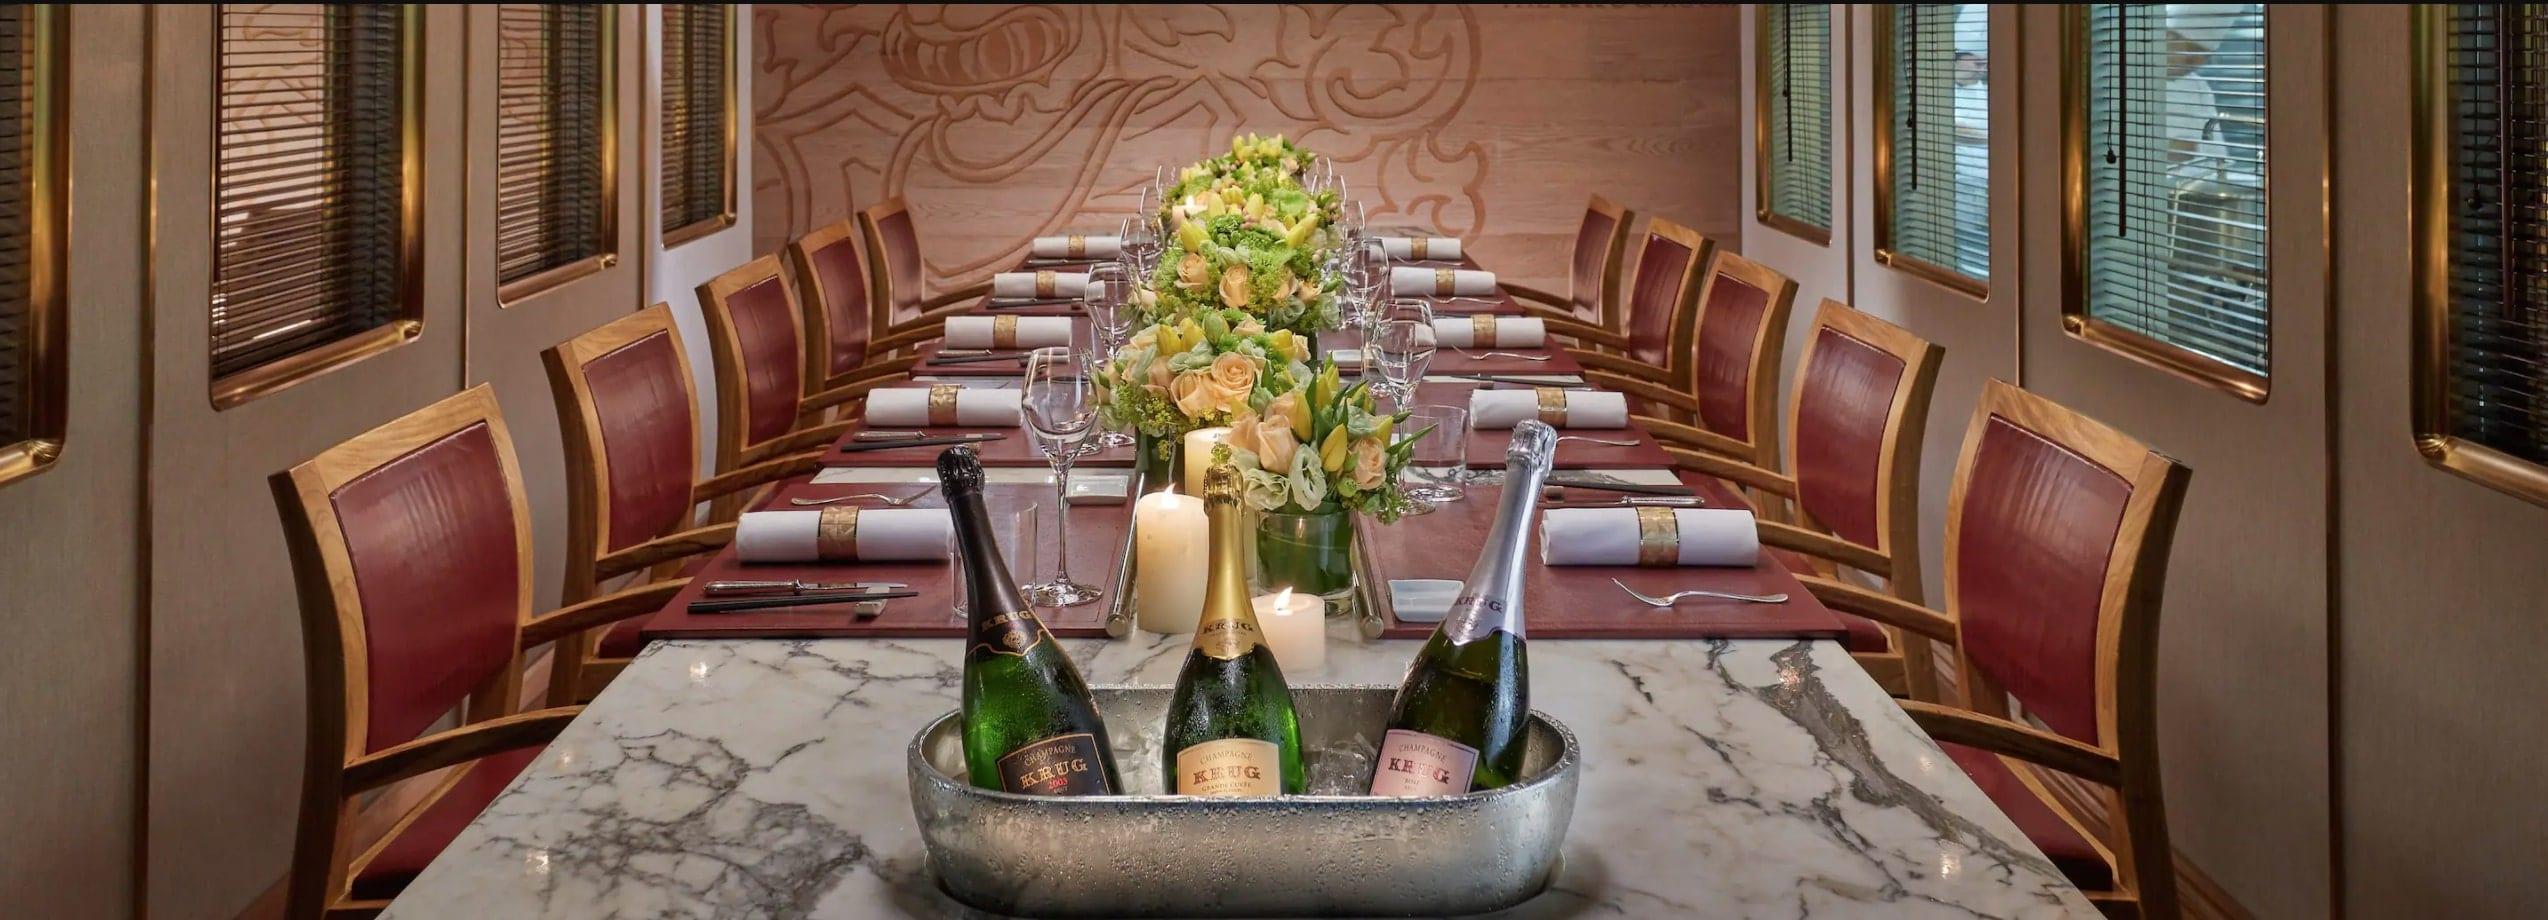 Most Expensive Restaurants - The Krug Room